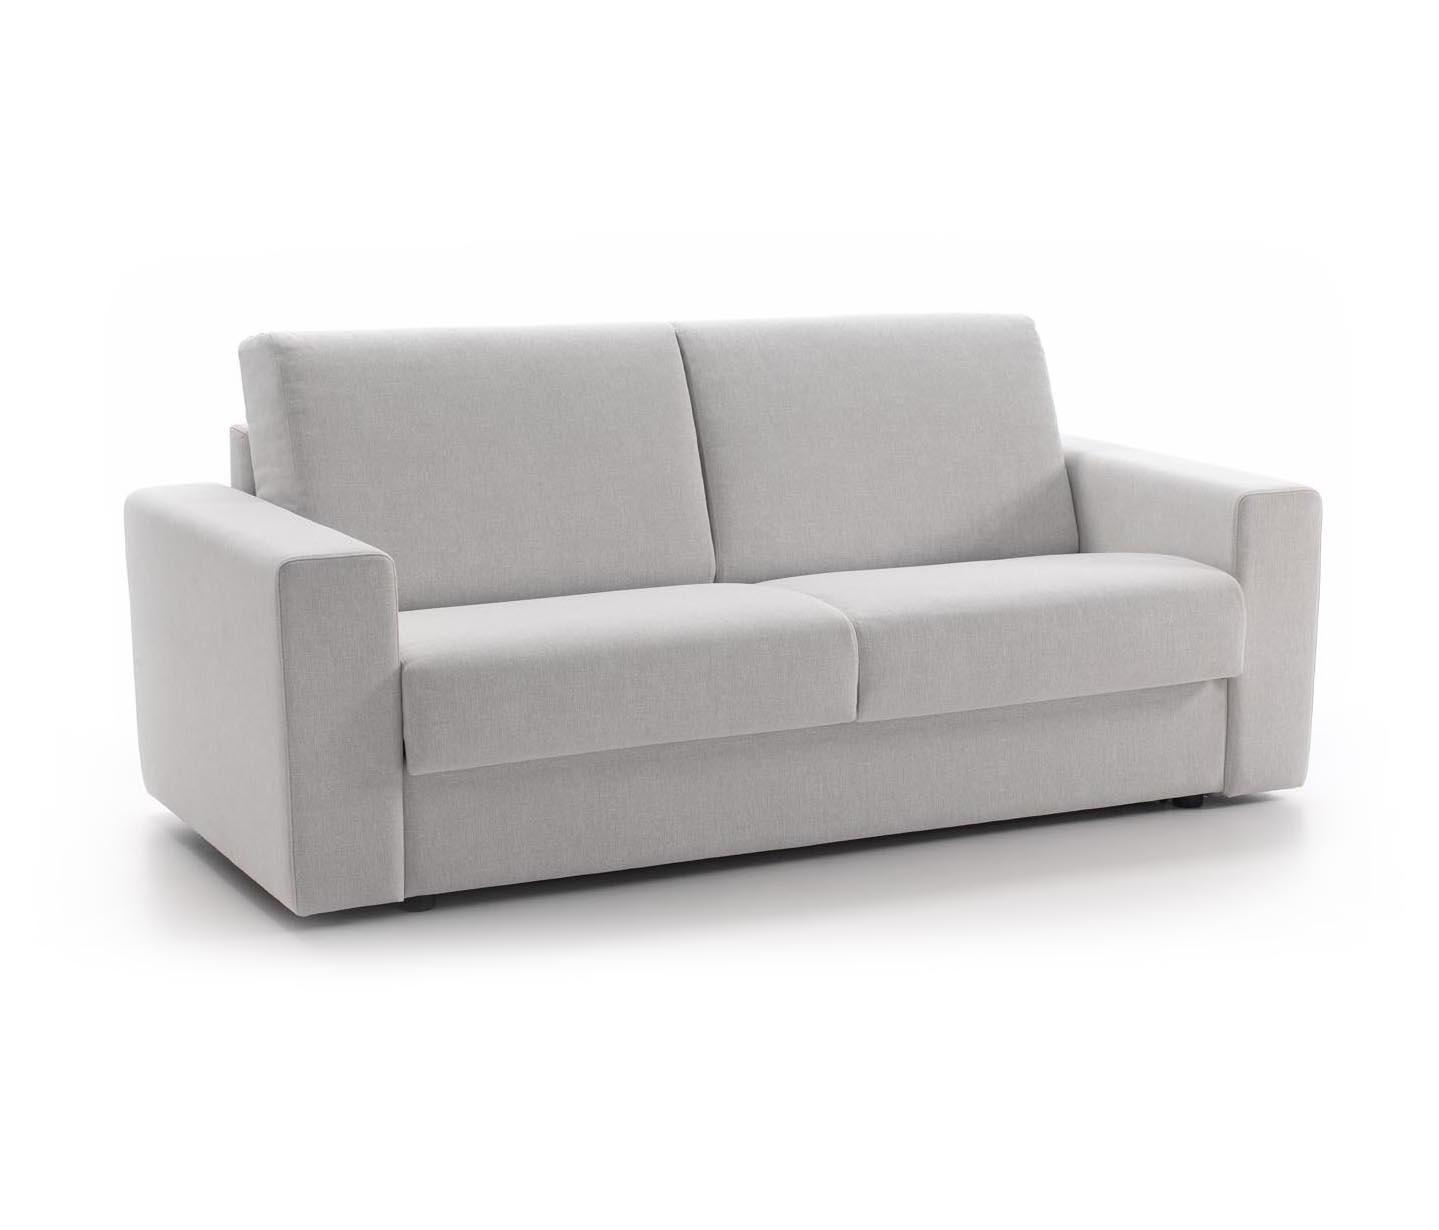 Daro option a sof s cama de belta frajumar architonic - Fabricantes sofas yecla ...